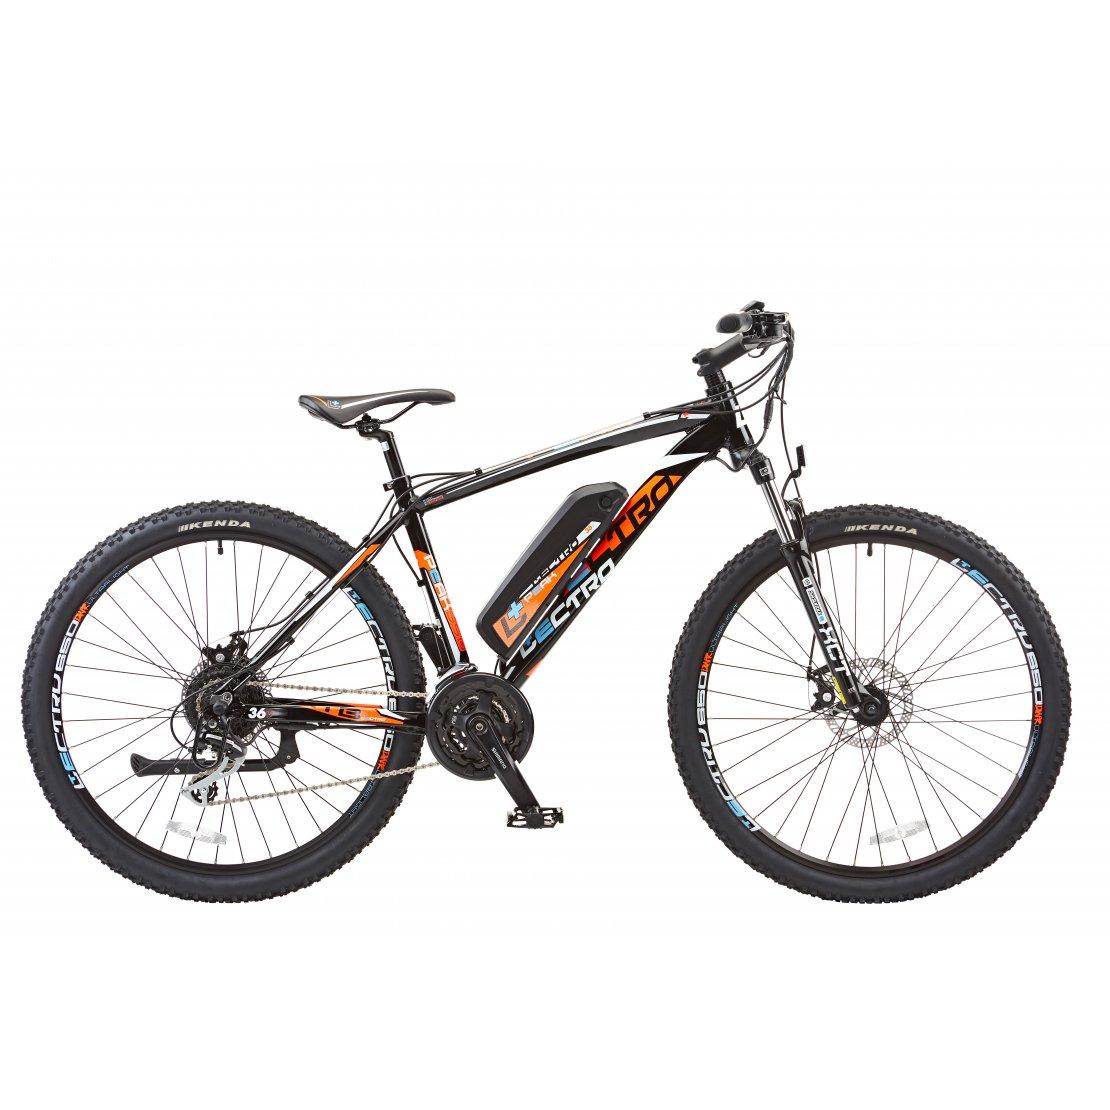 18 Peak 24 Speed 36v E Bike 27 5 Wheel Gents Black